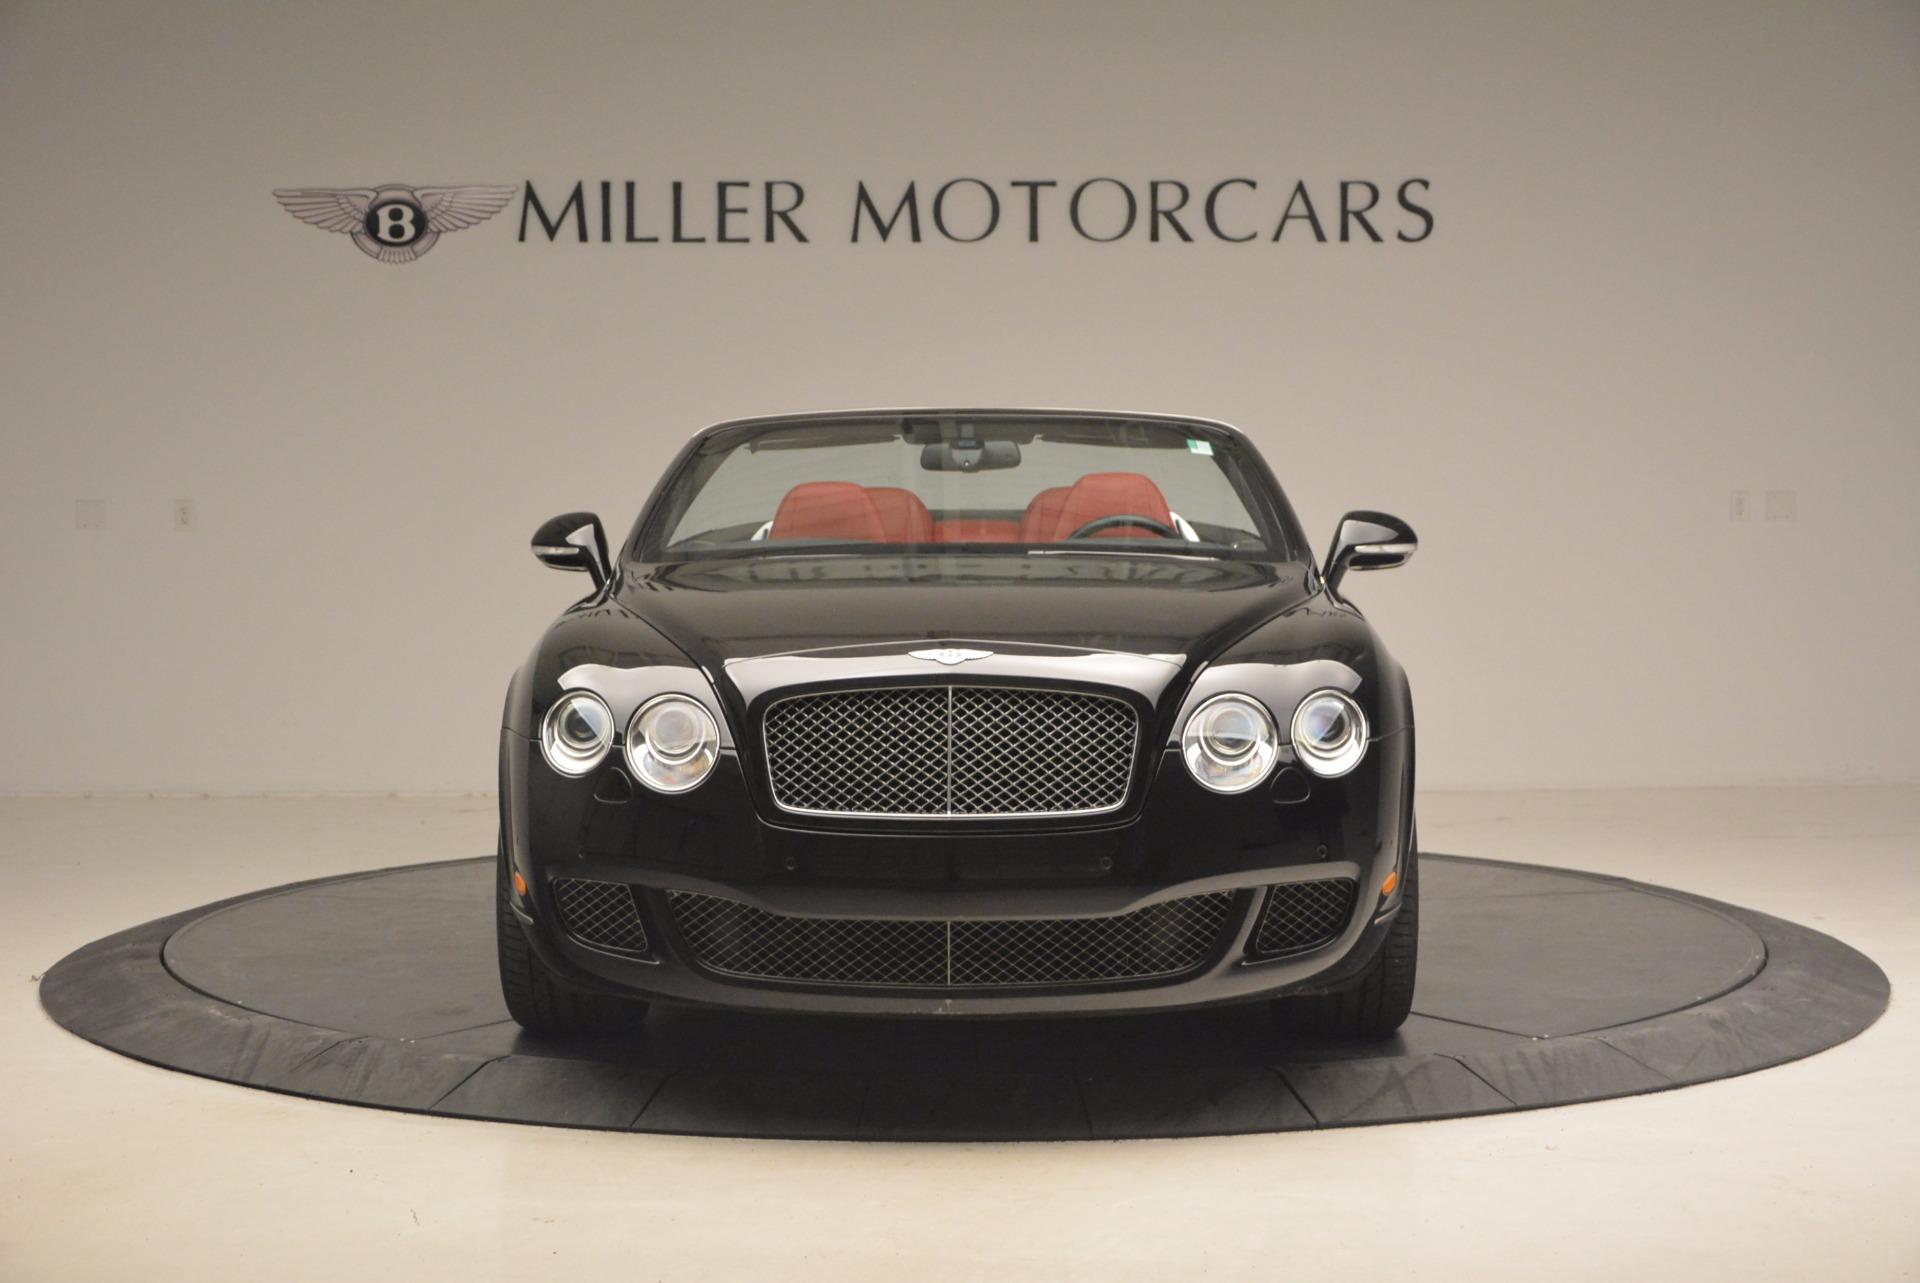 Used 2010 Bentley Continental GT Speed For Sale In Westport, CT 1298_p12